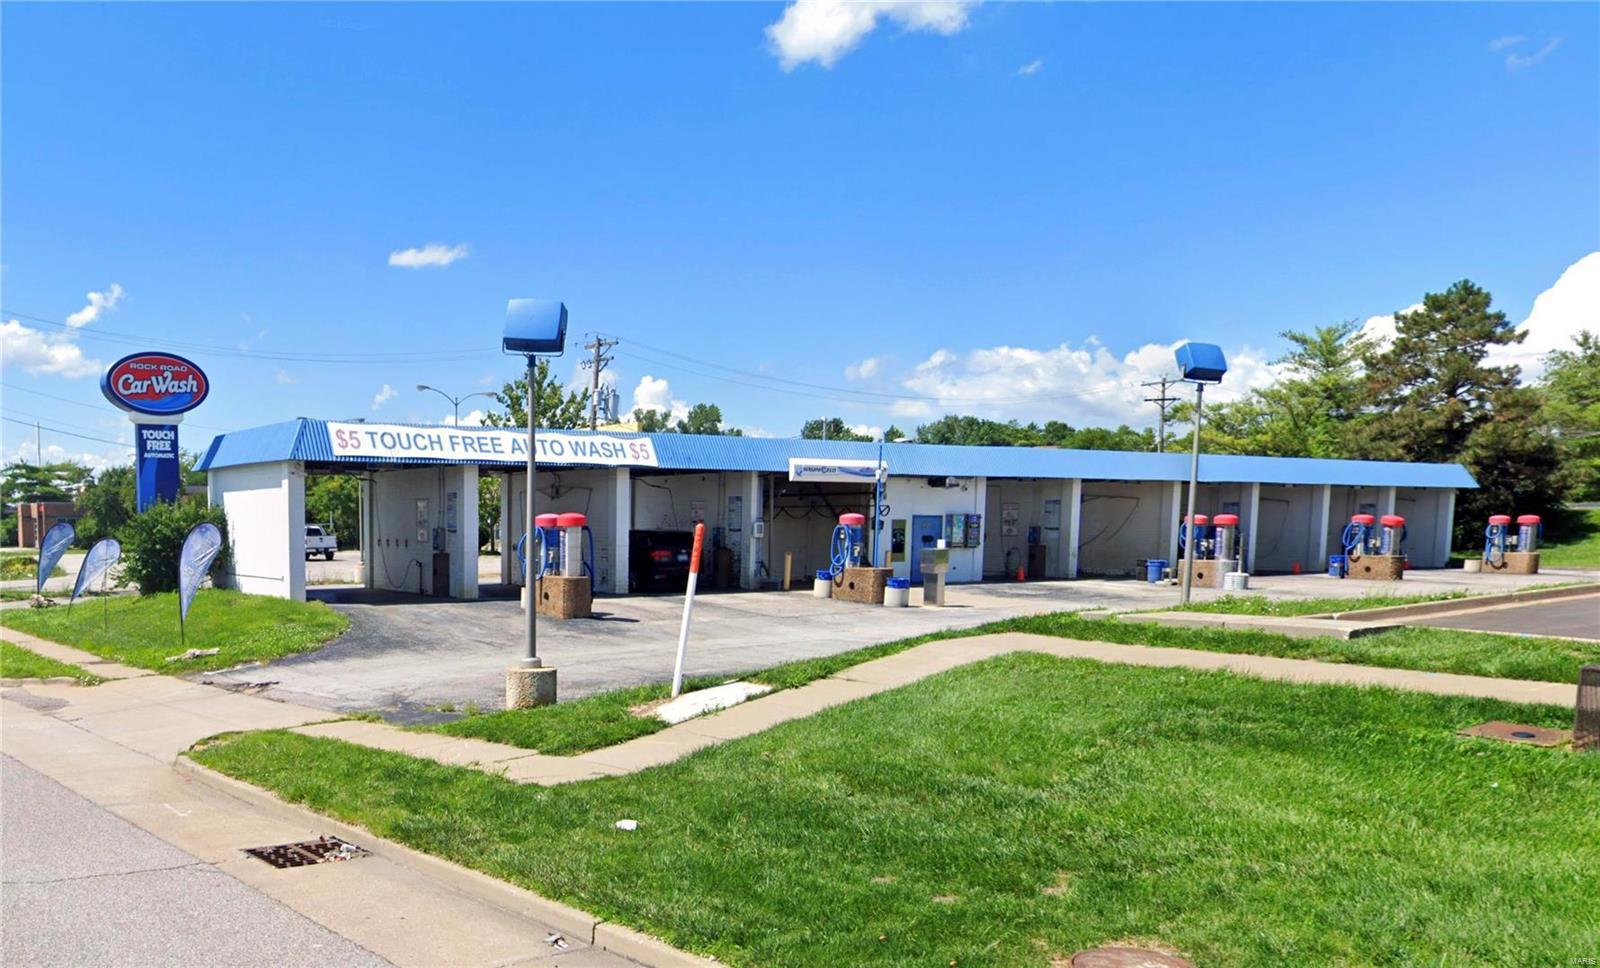 12001 Saint Charles Rock Property Photo - Bridgeton, MO real estate listing